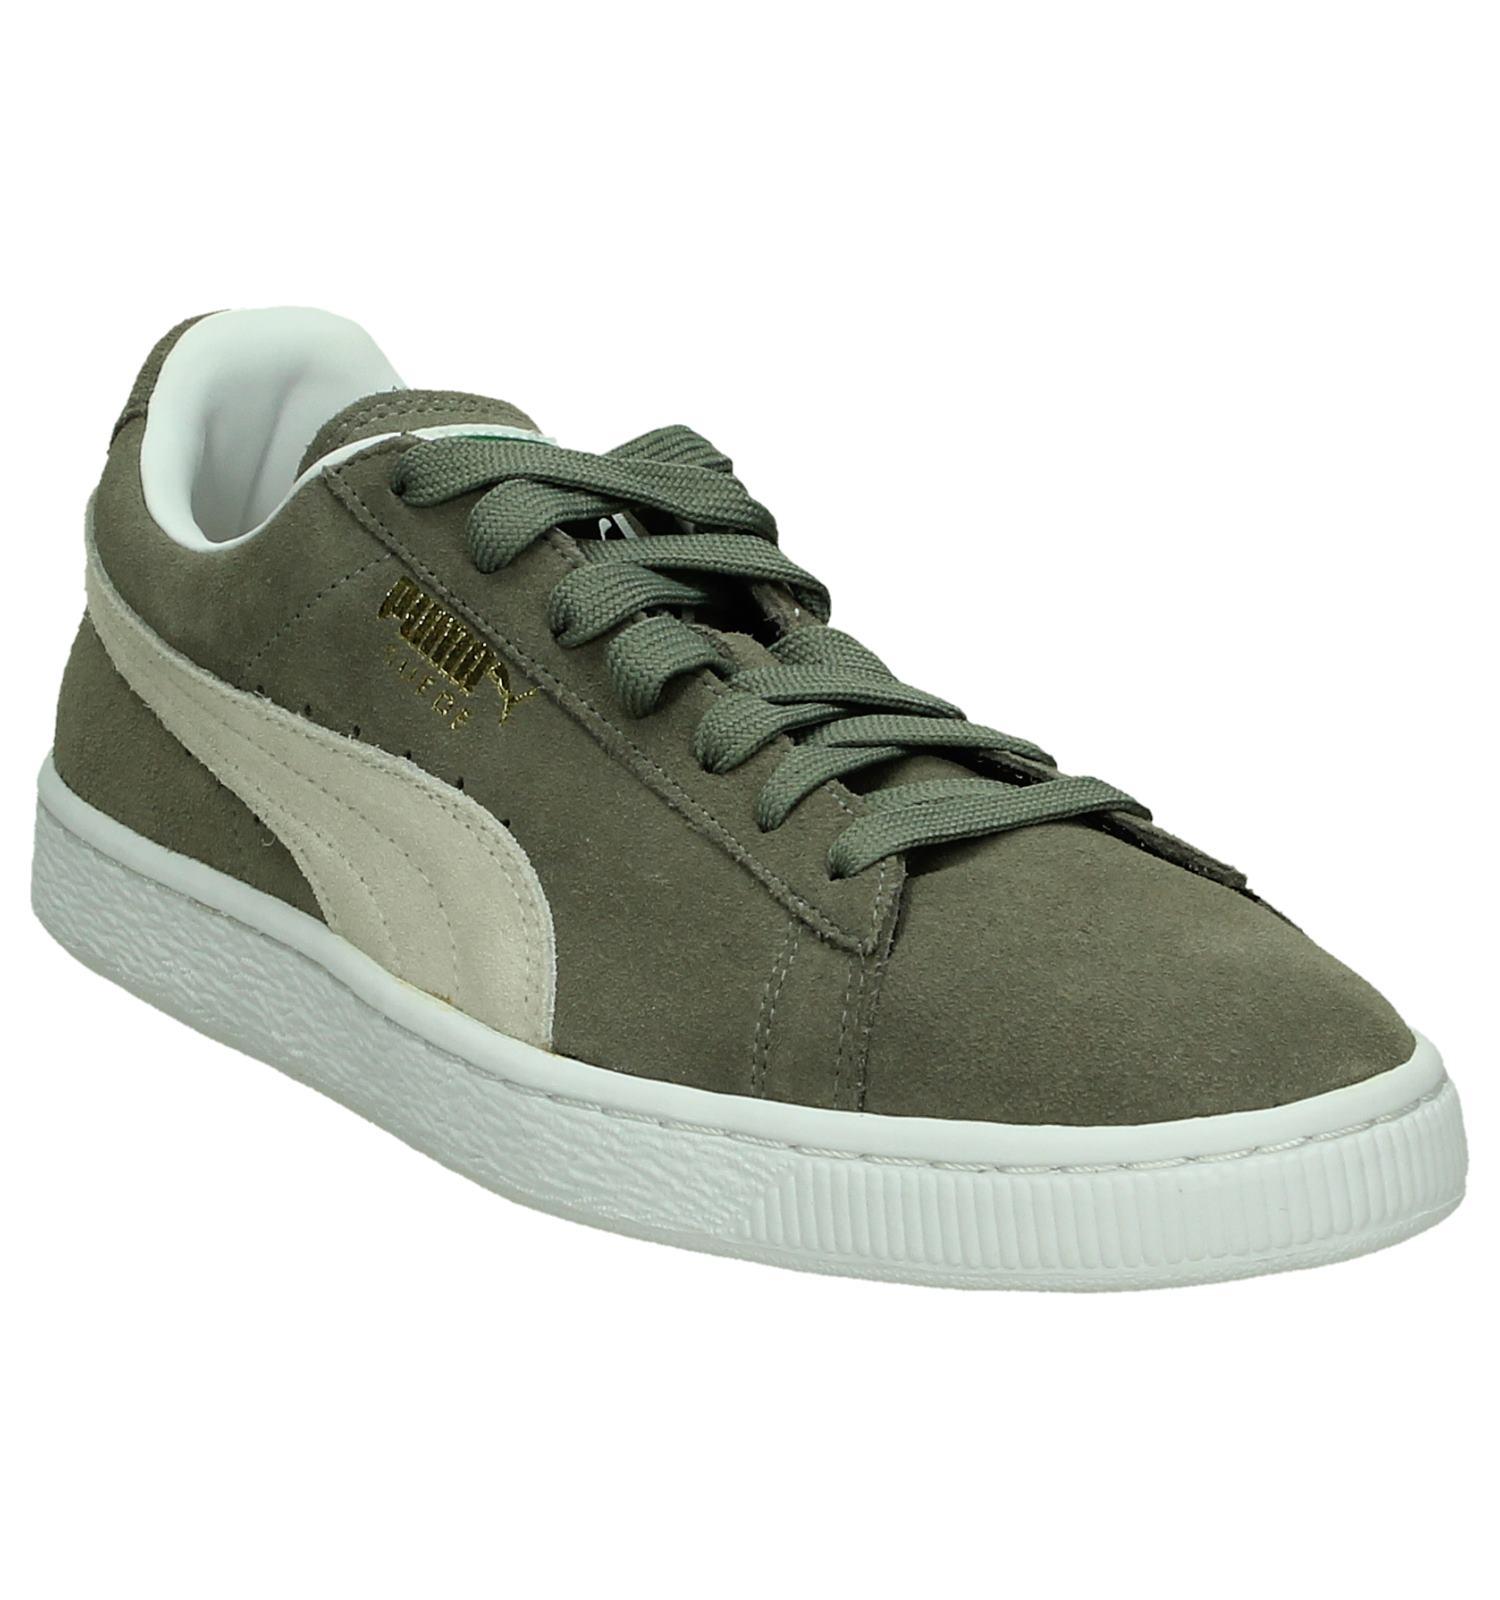 0e2c9c3e4bb Grijze Sneakers Puma Suede Classic | TORFS.BE | Gratis verzend en retour